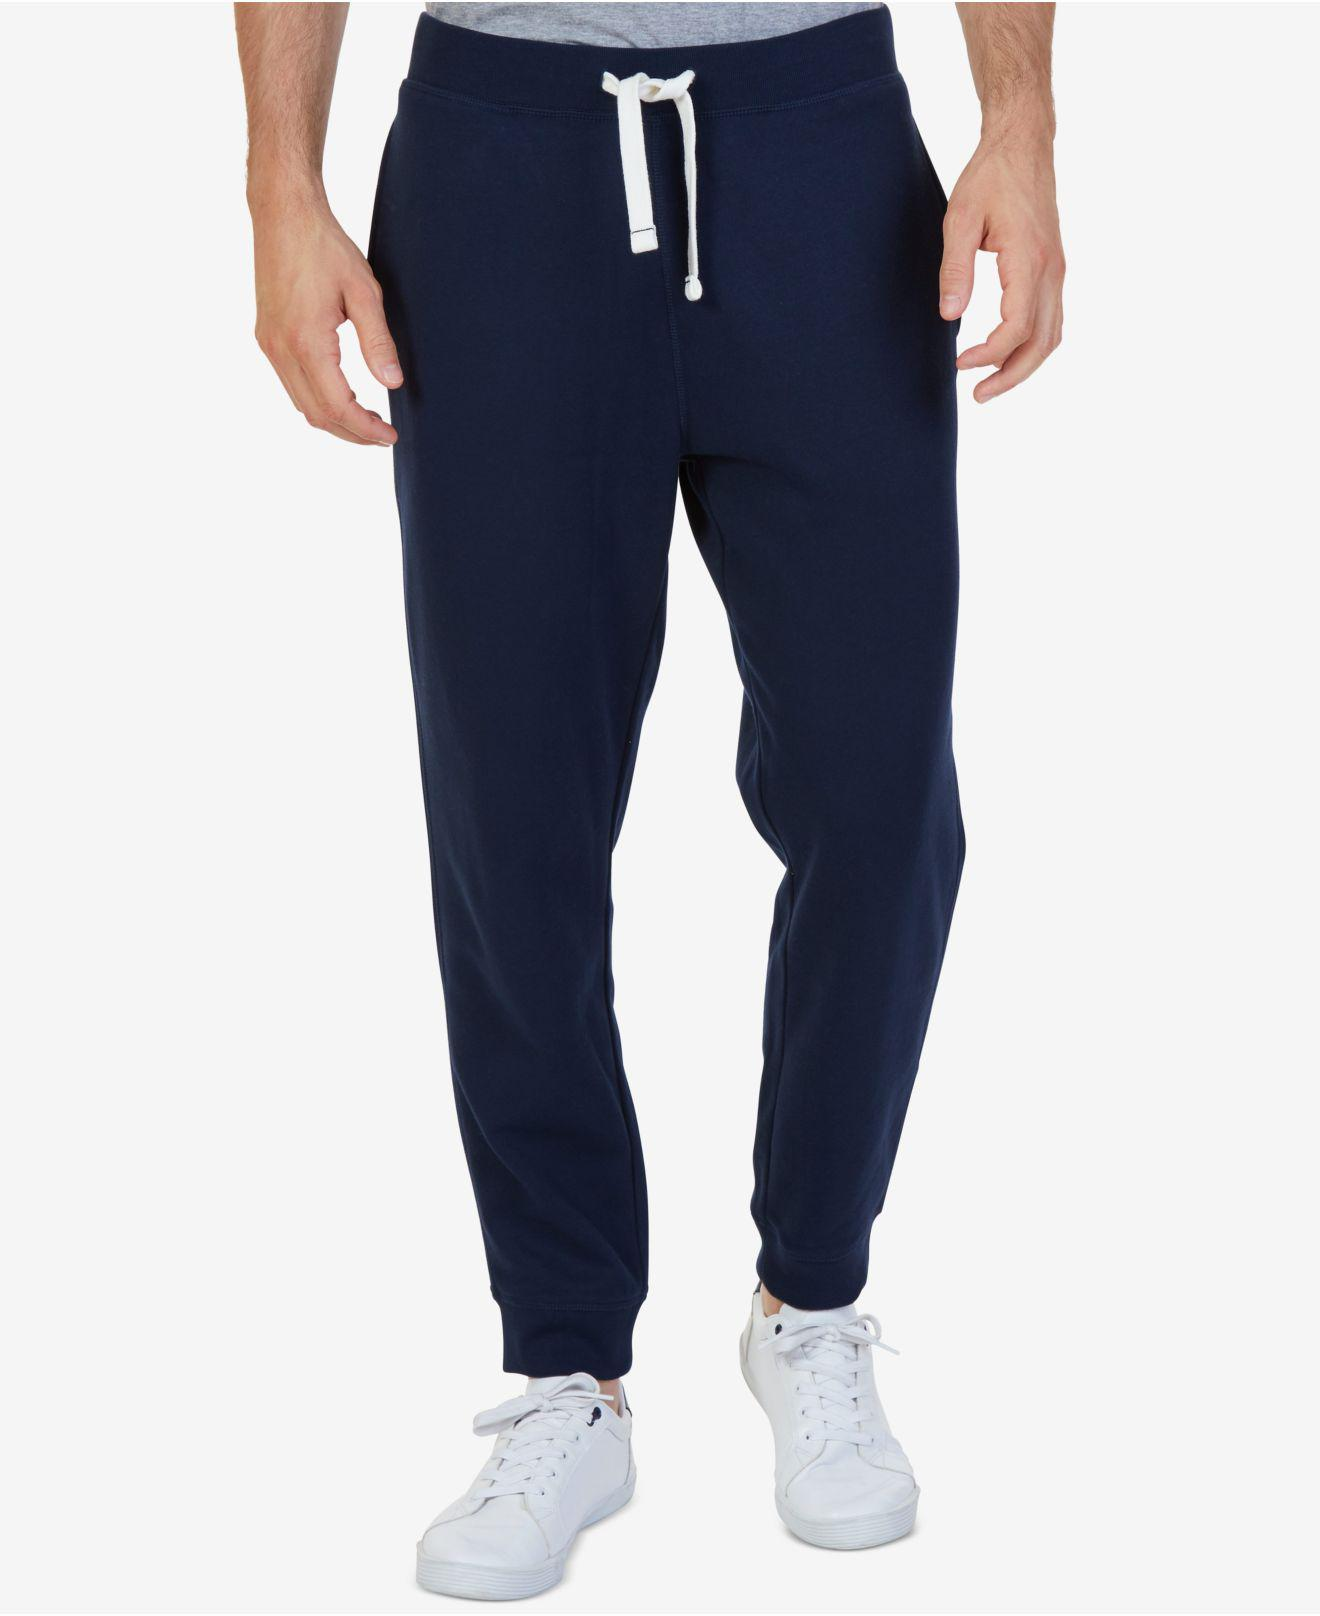 728e68106e9 Lyst - Nautica Big   Tall Jogger Pants in Blue for Men